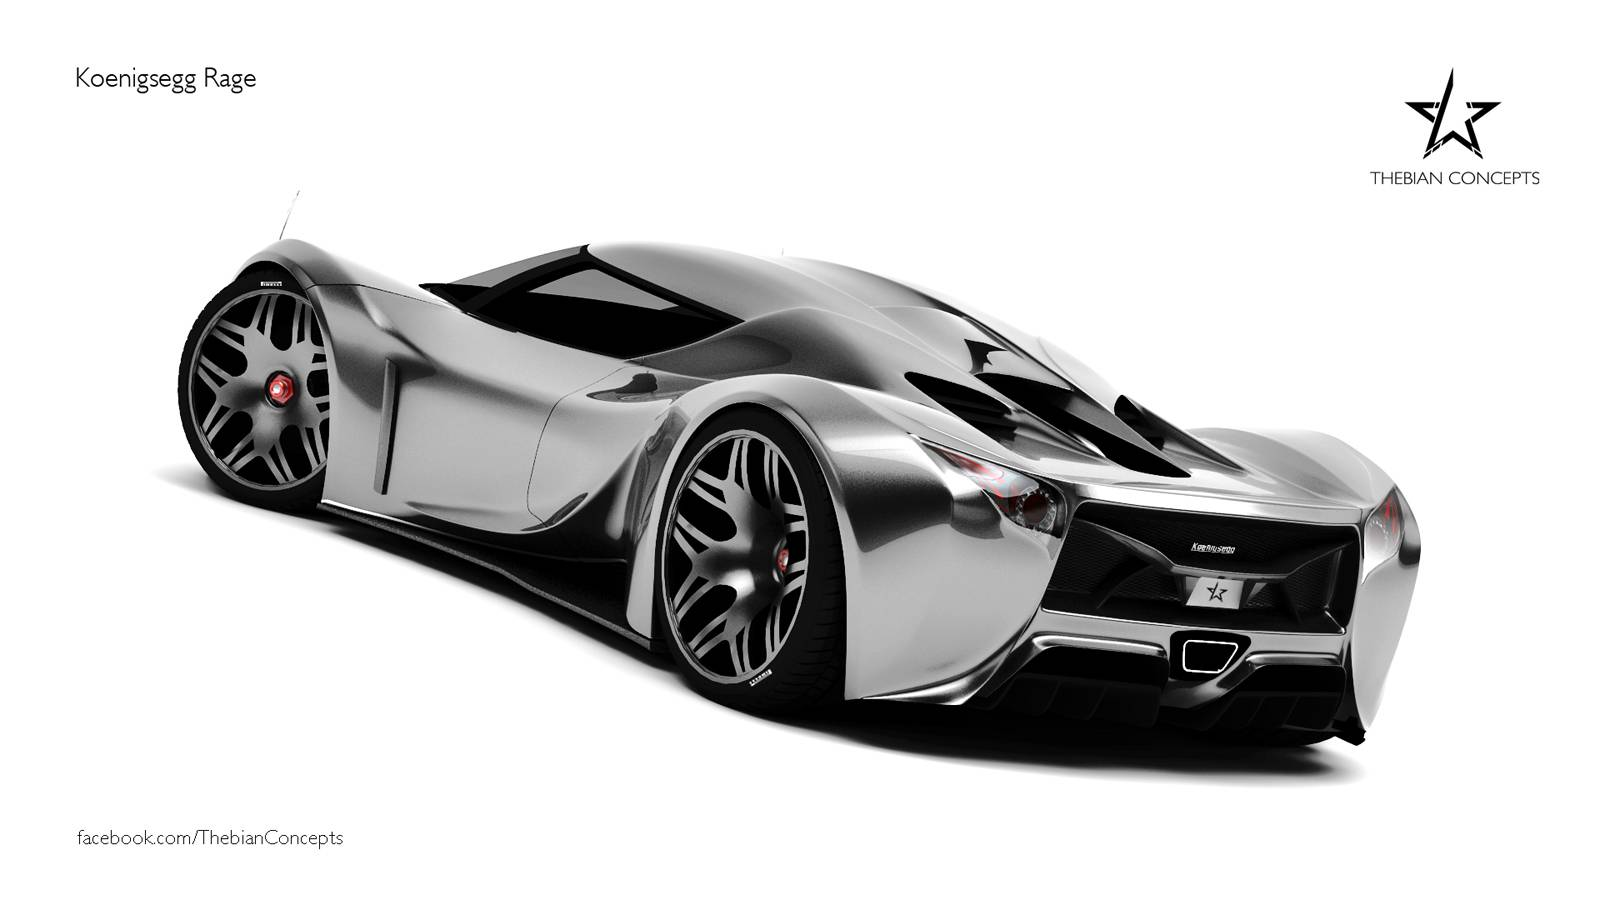 Render Koenigsegg Rage Concept By Maher Thebian Gtspirit